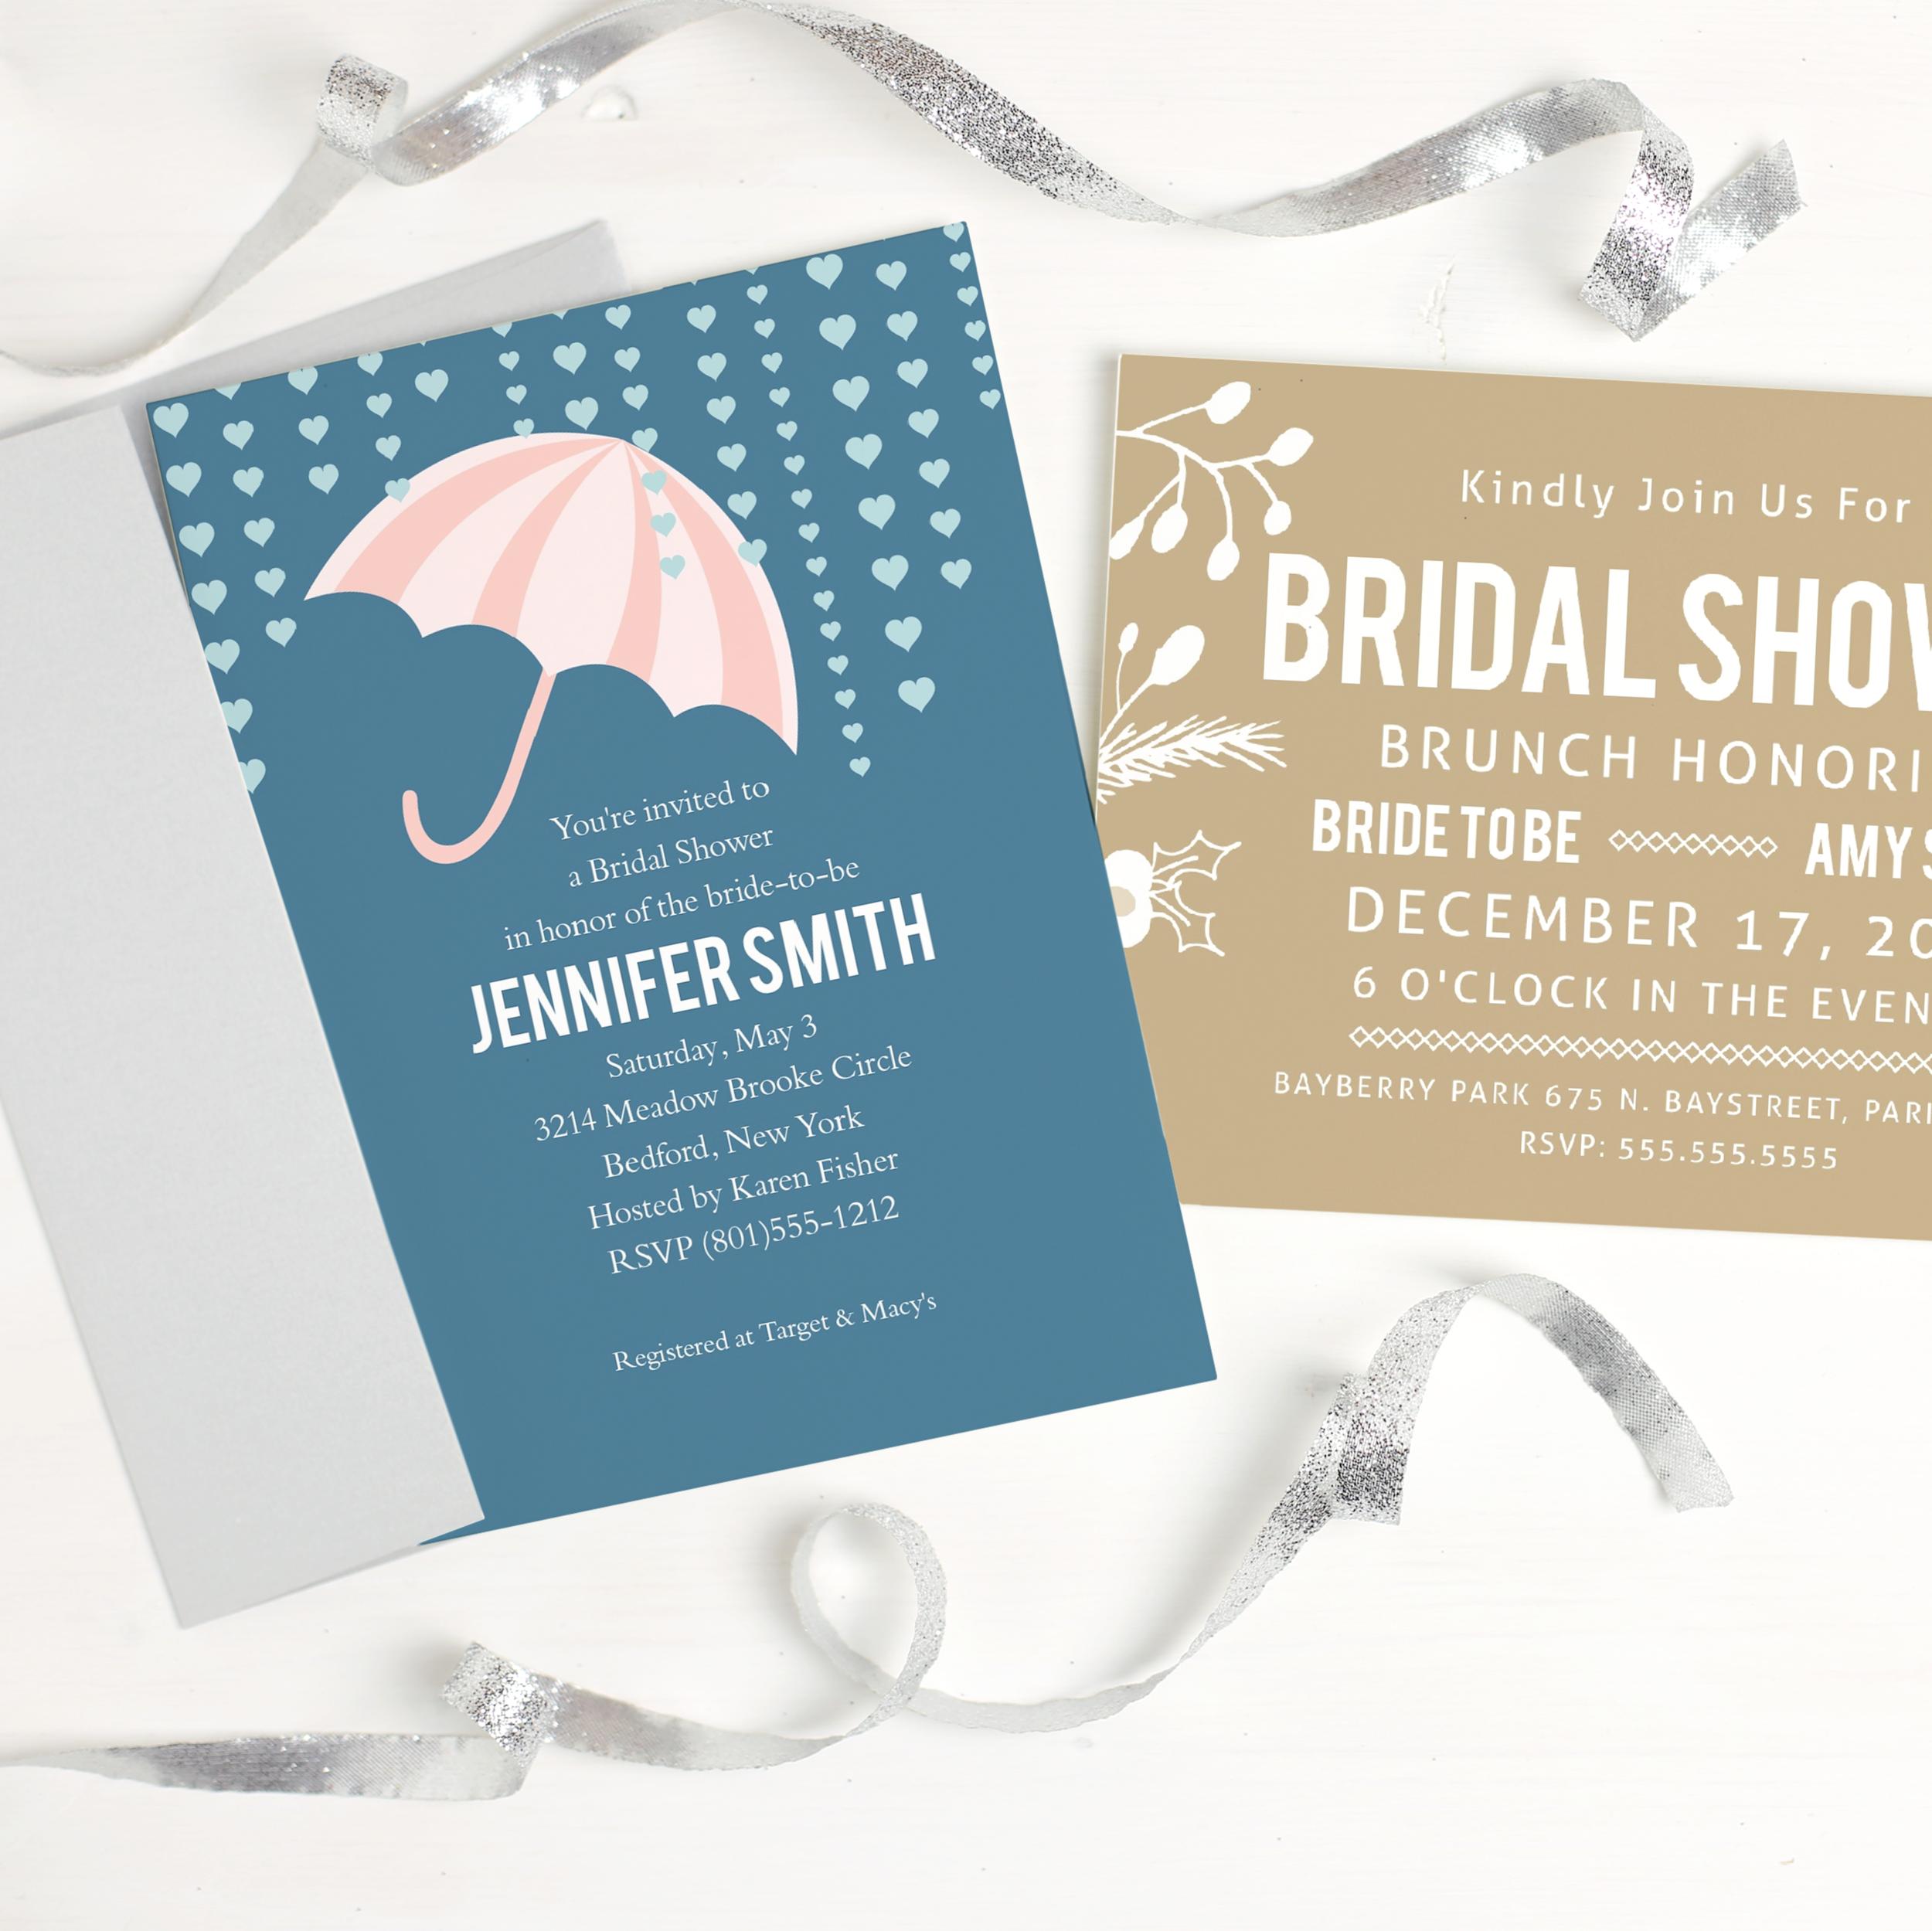 Basic_Invite_Bridal_Shower_Invitations.png